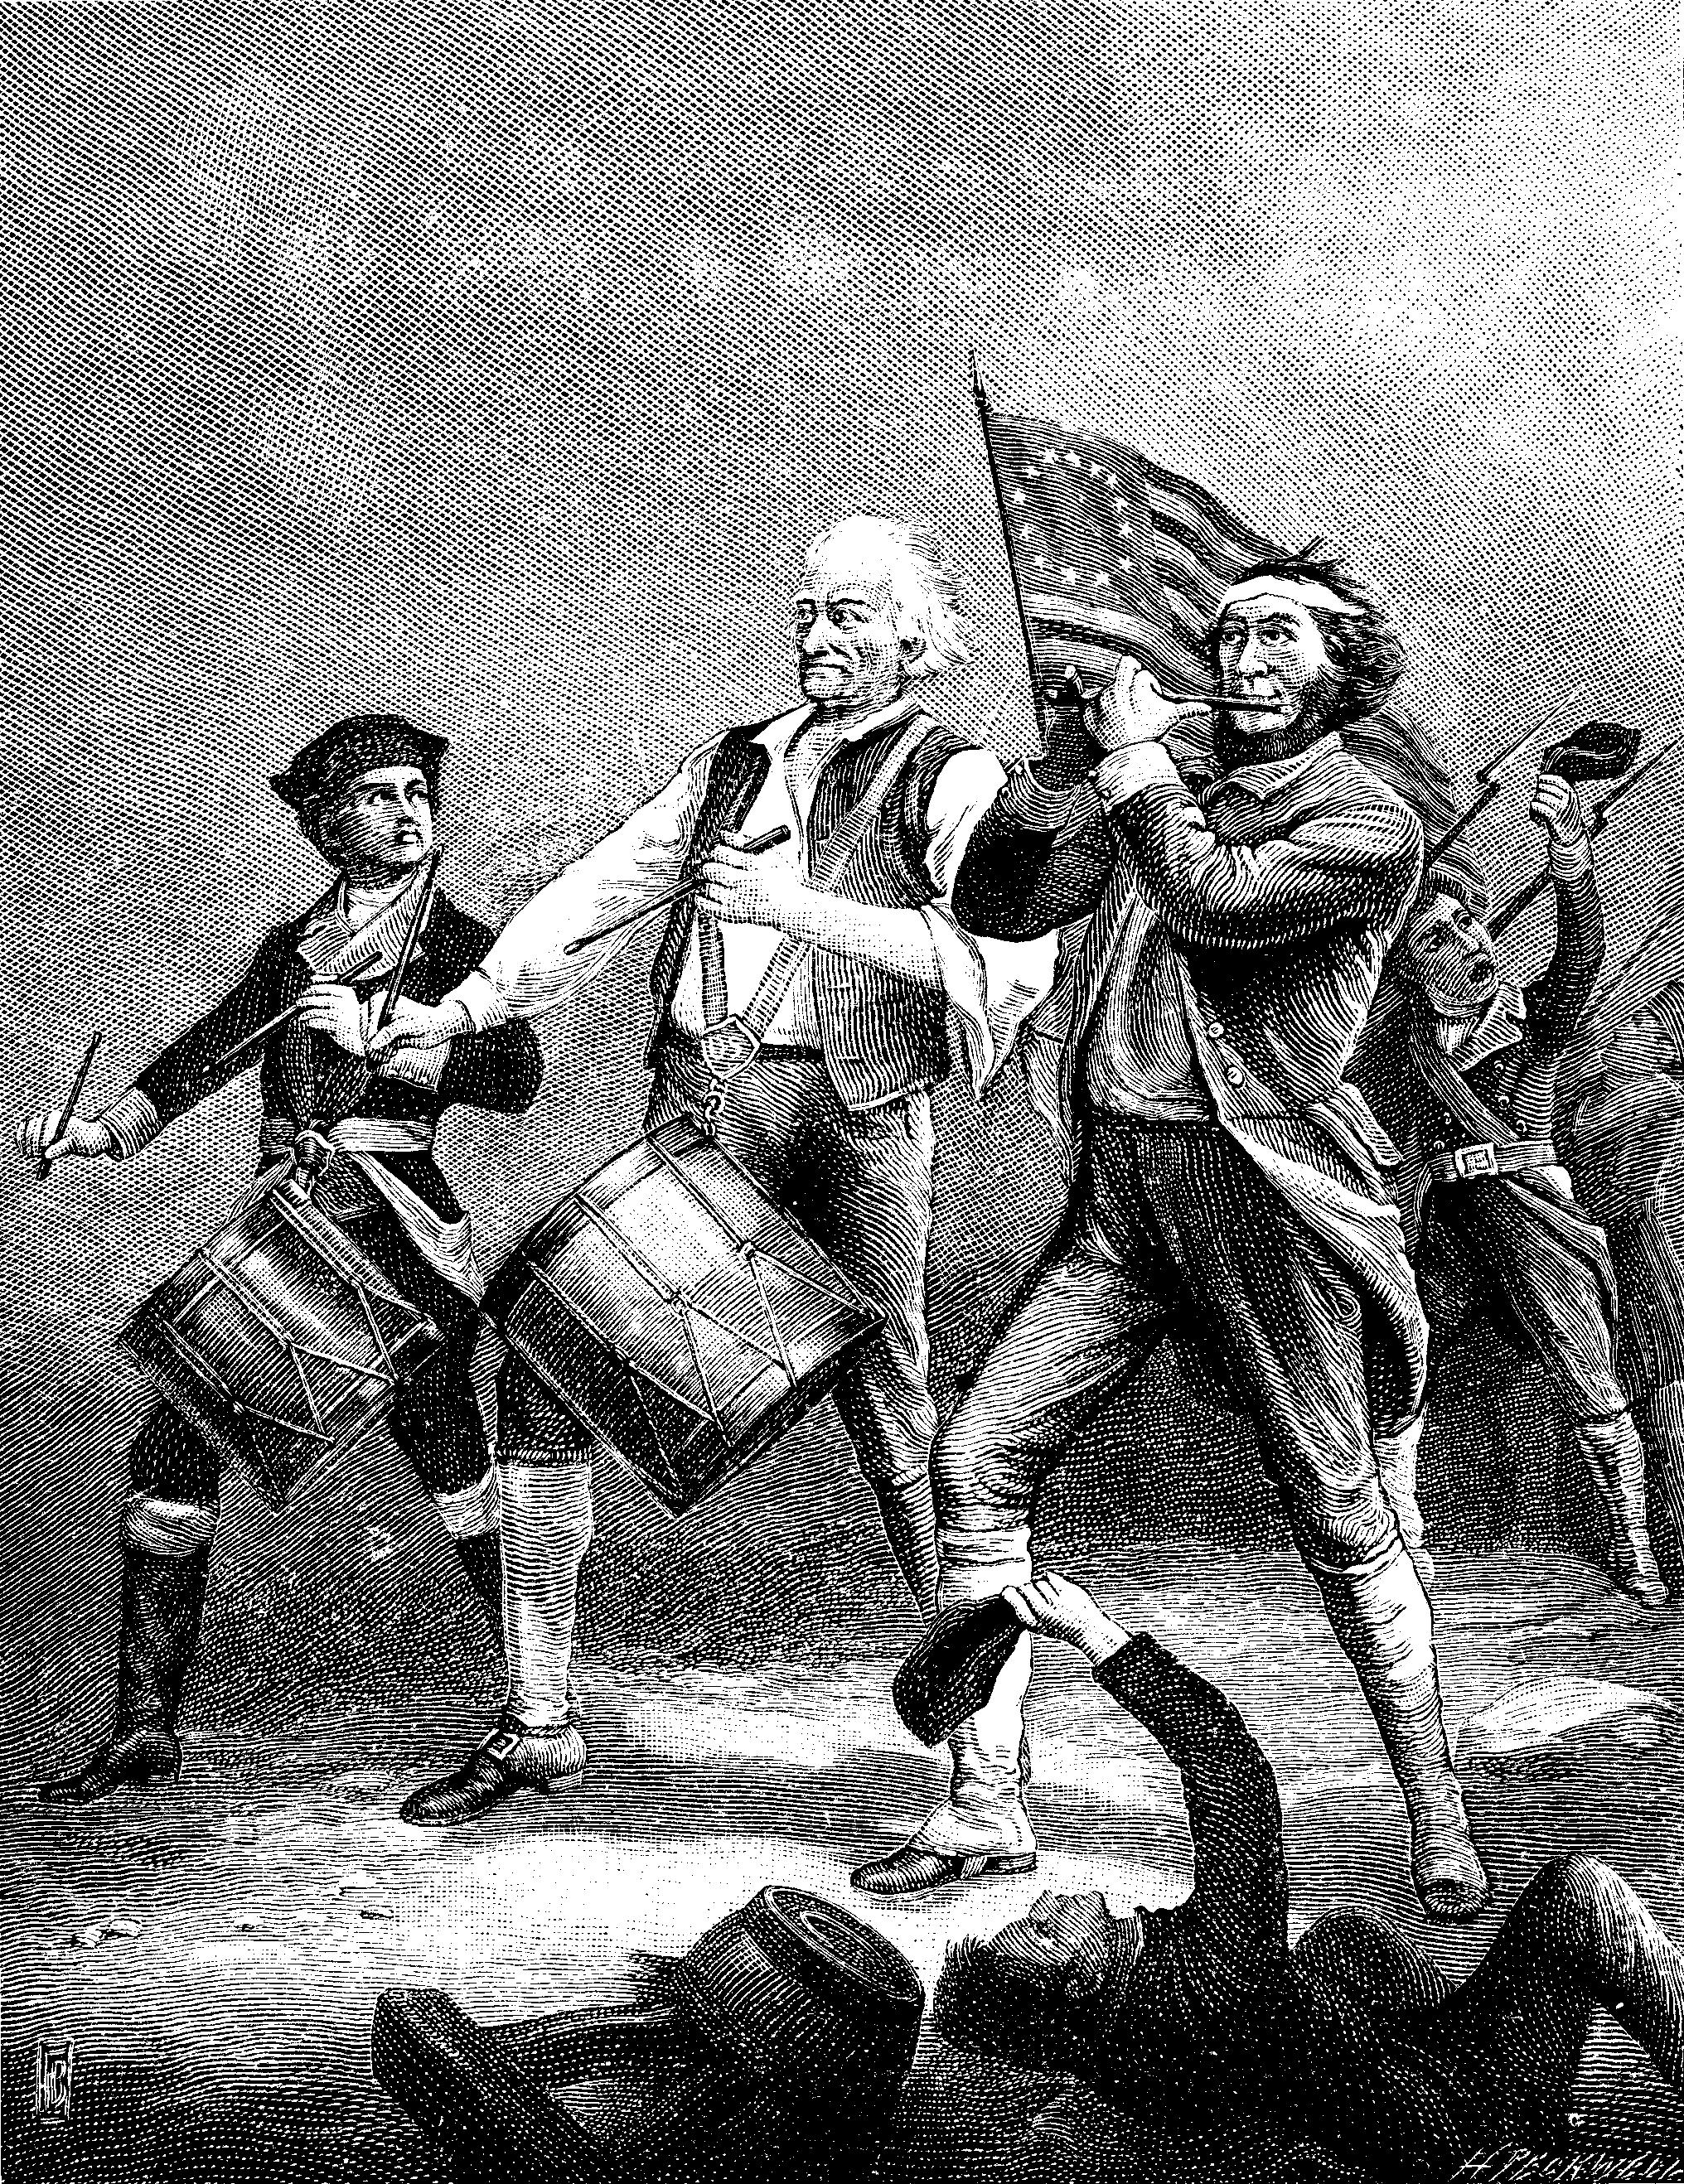 Description Yankee Doodle BAH-p102 pngYankee